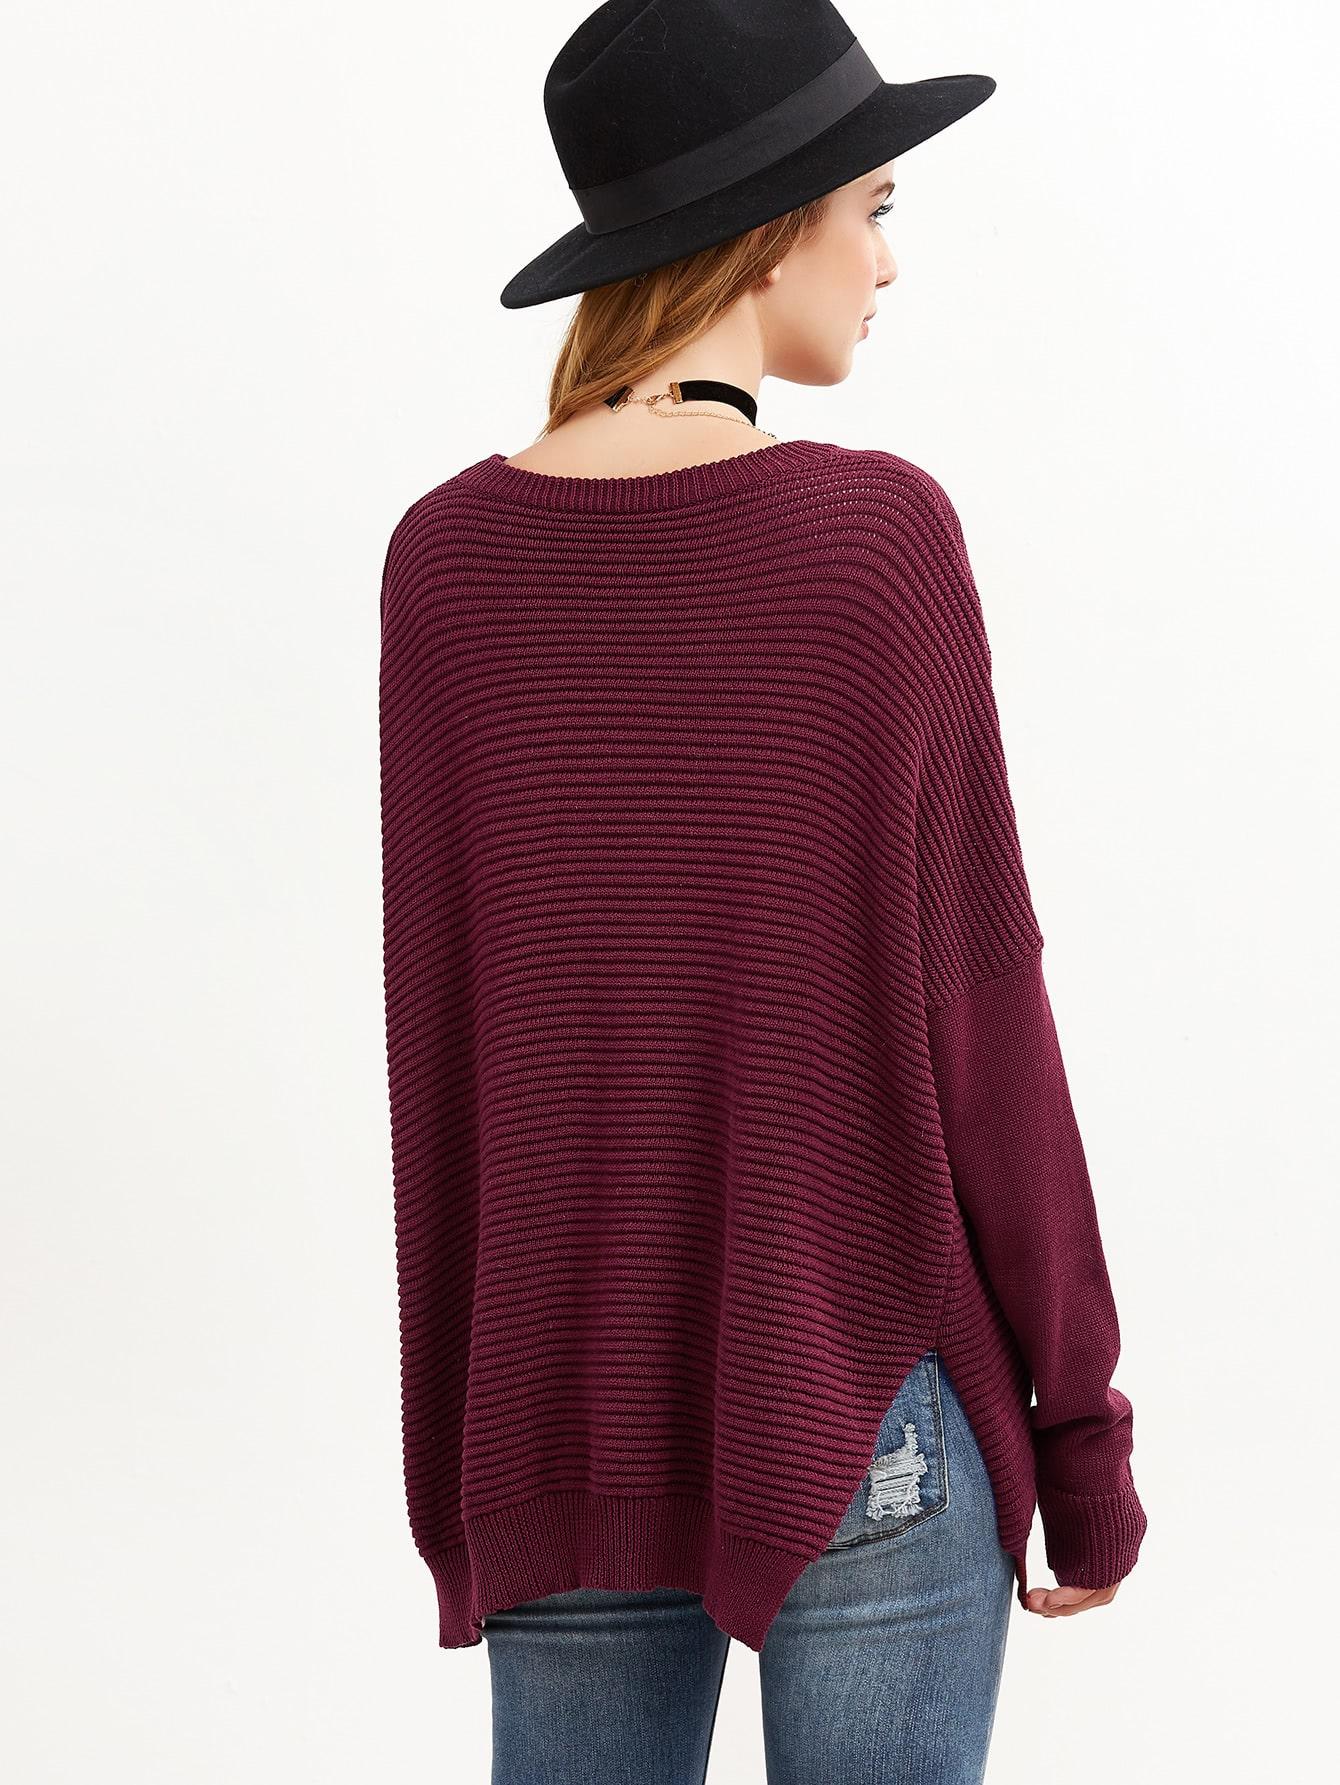 sweater161107462_2